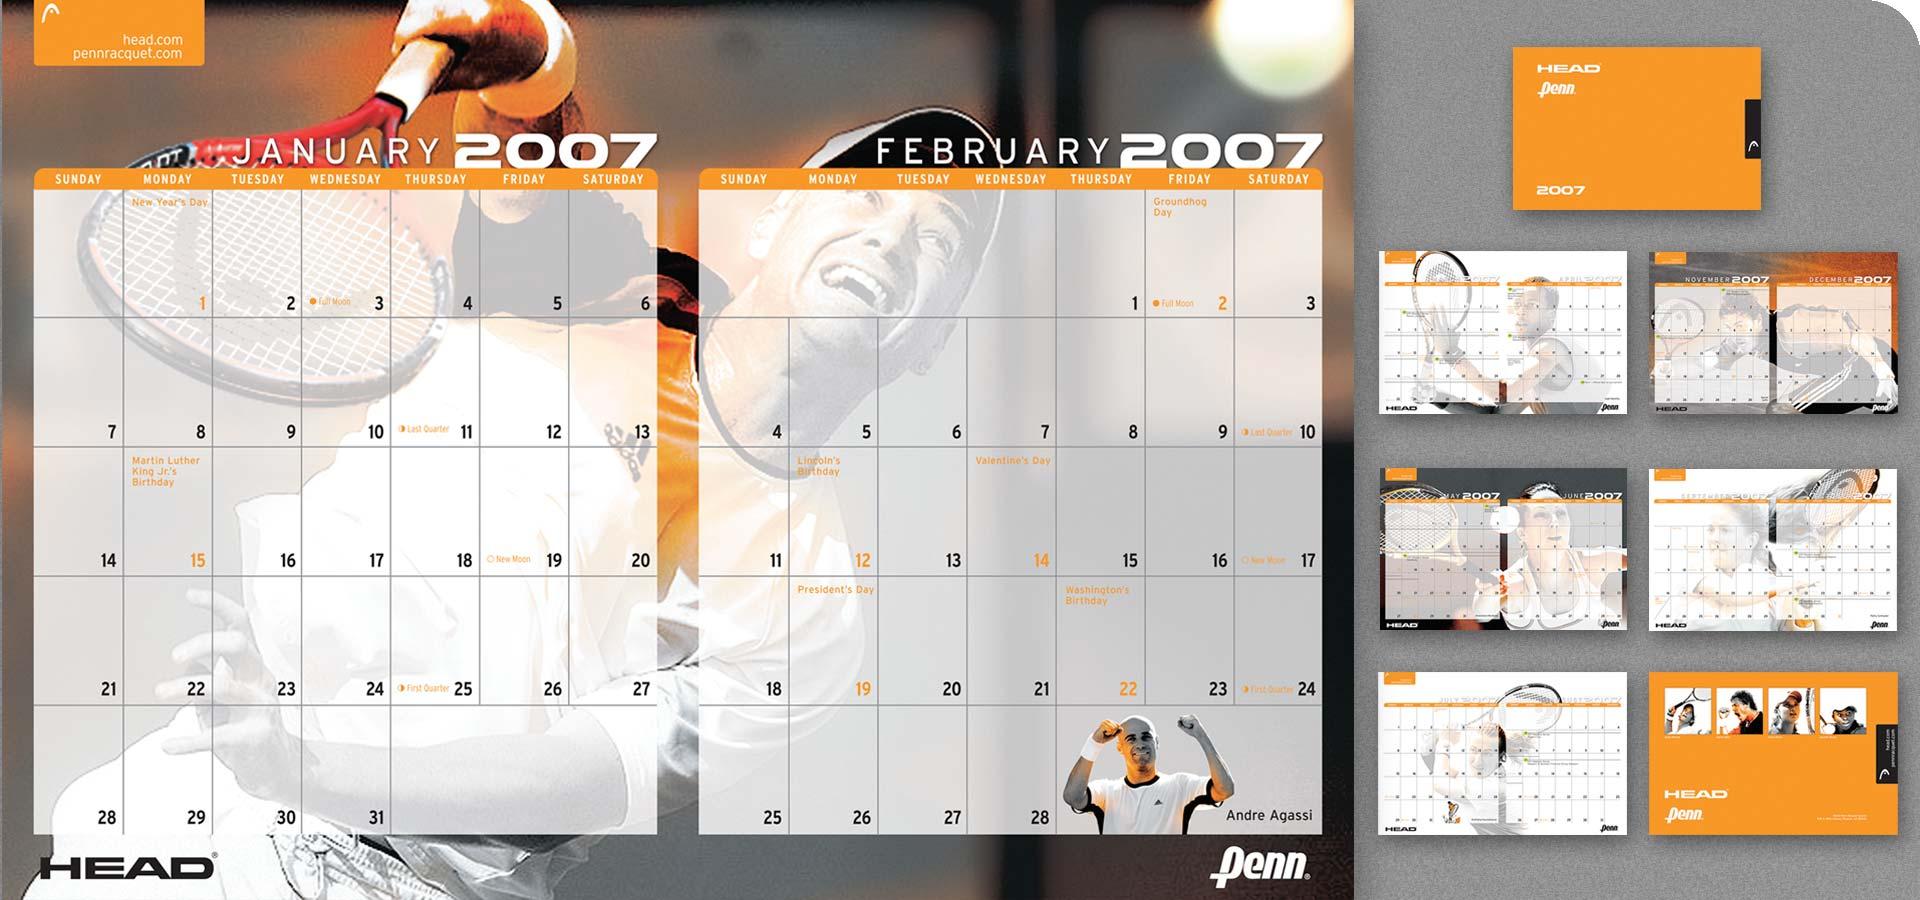 Calendar Head Design : Head penn calendar creative harvest